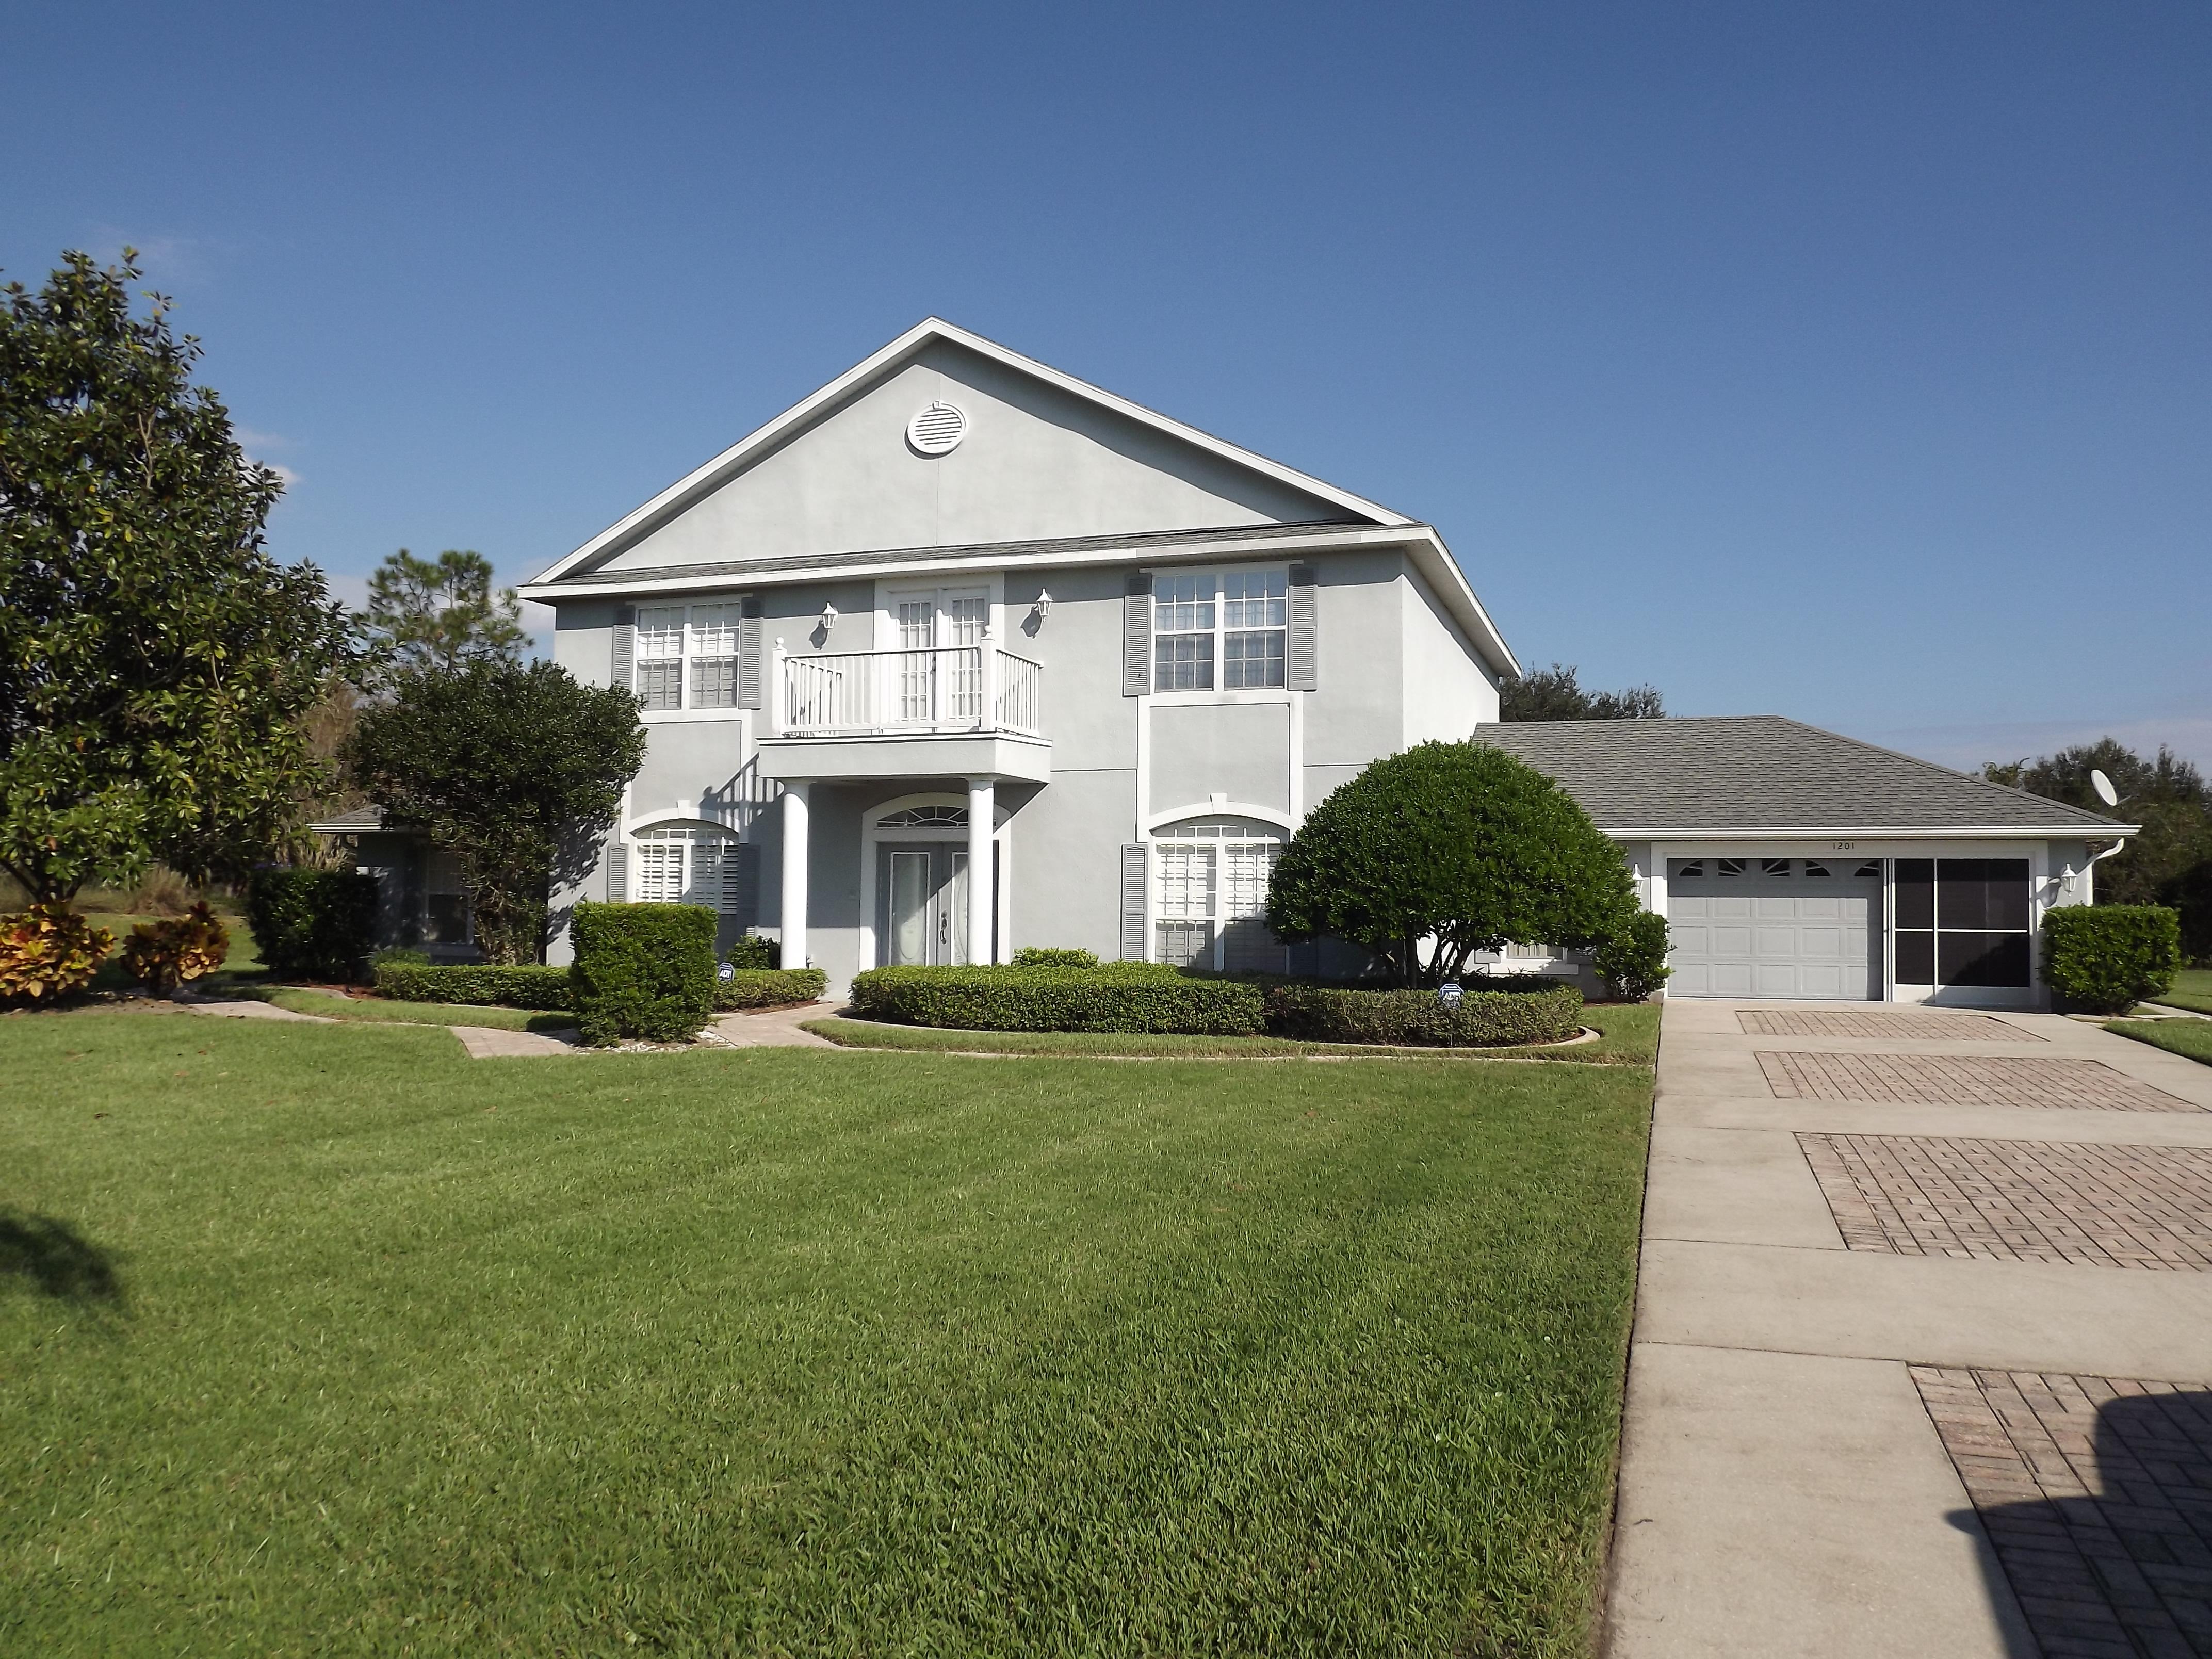 1201 Providence Blvd, Kissimmee, Florida 34744